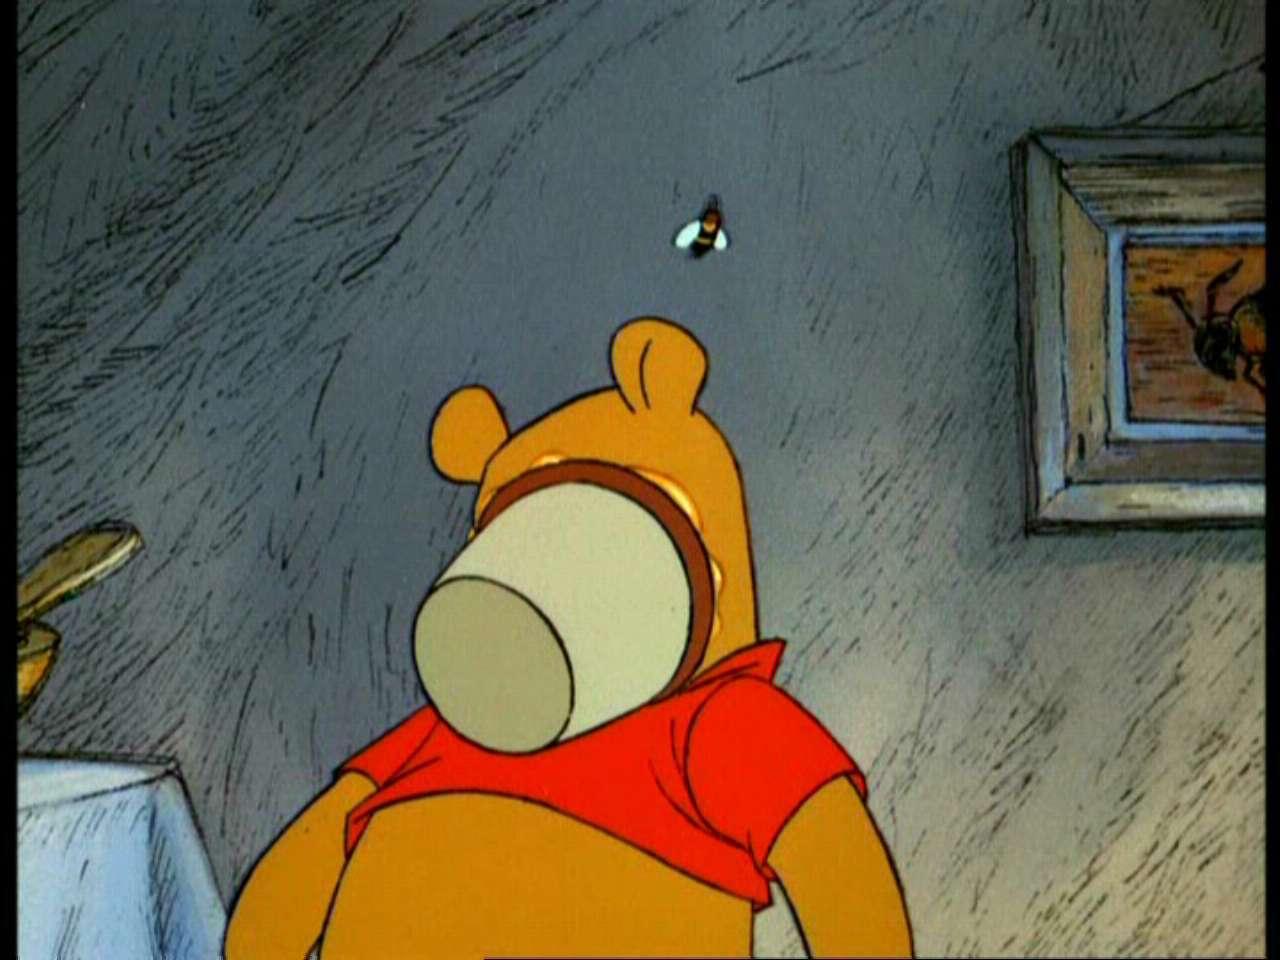 Winnie the Pooh and the Hunny mti